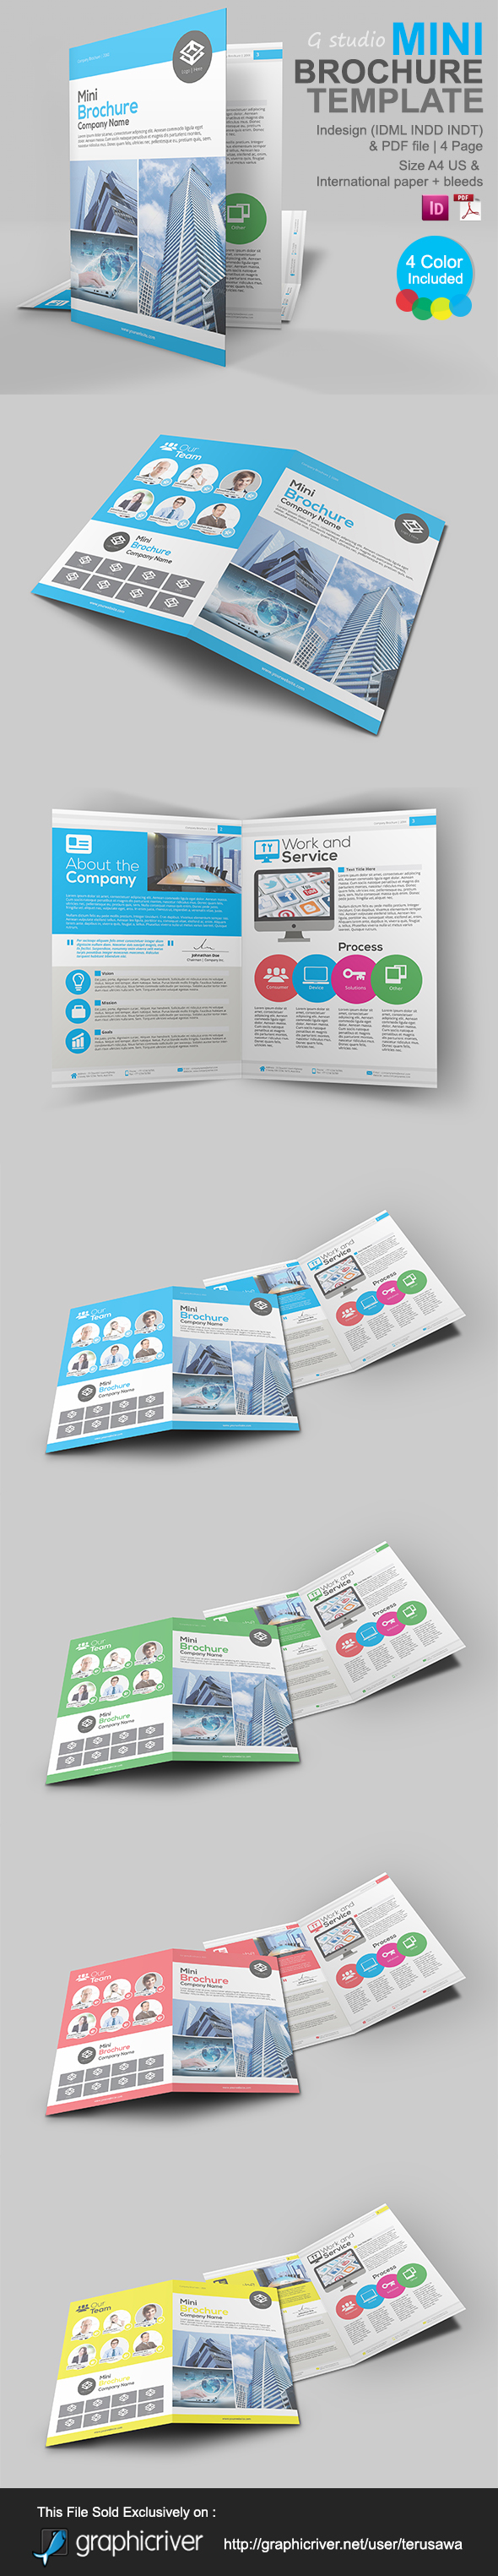 Gstudio Mini Brochure Template By Terusawa G Studio Via Behance - Mini brochure template